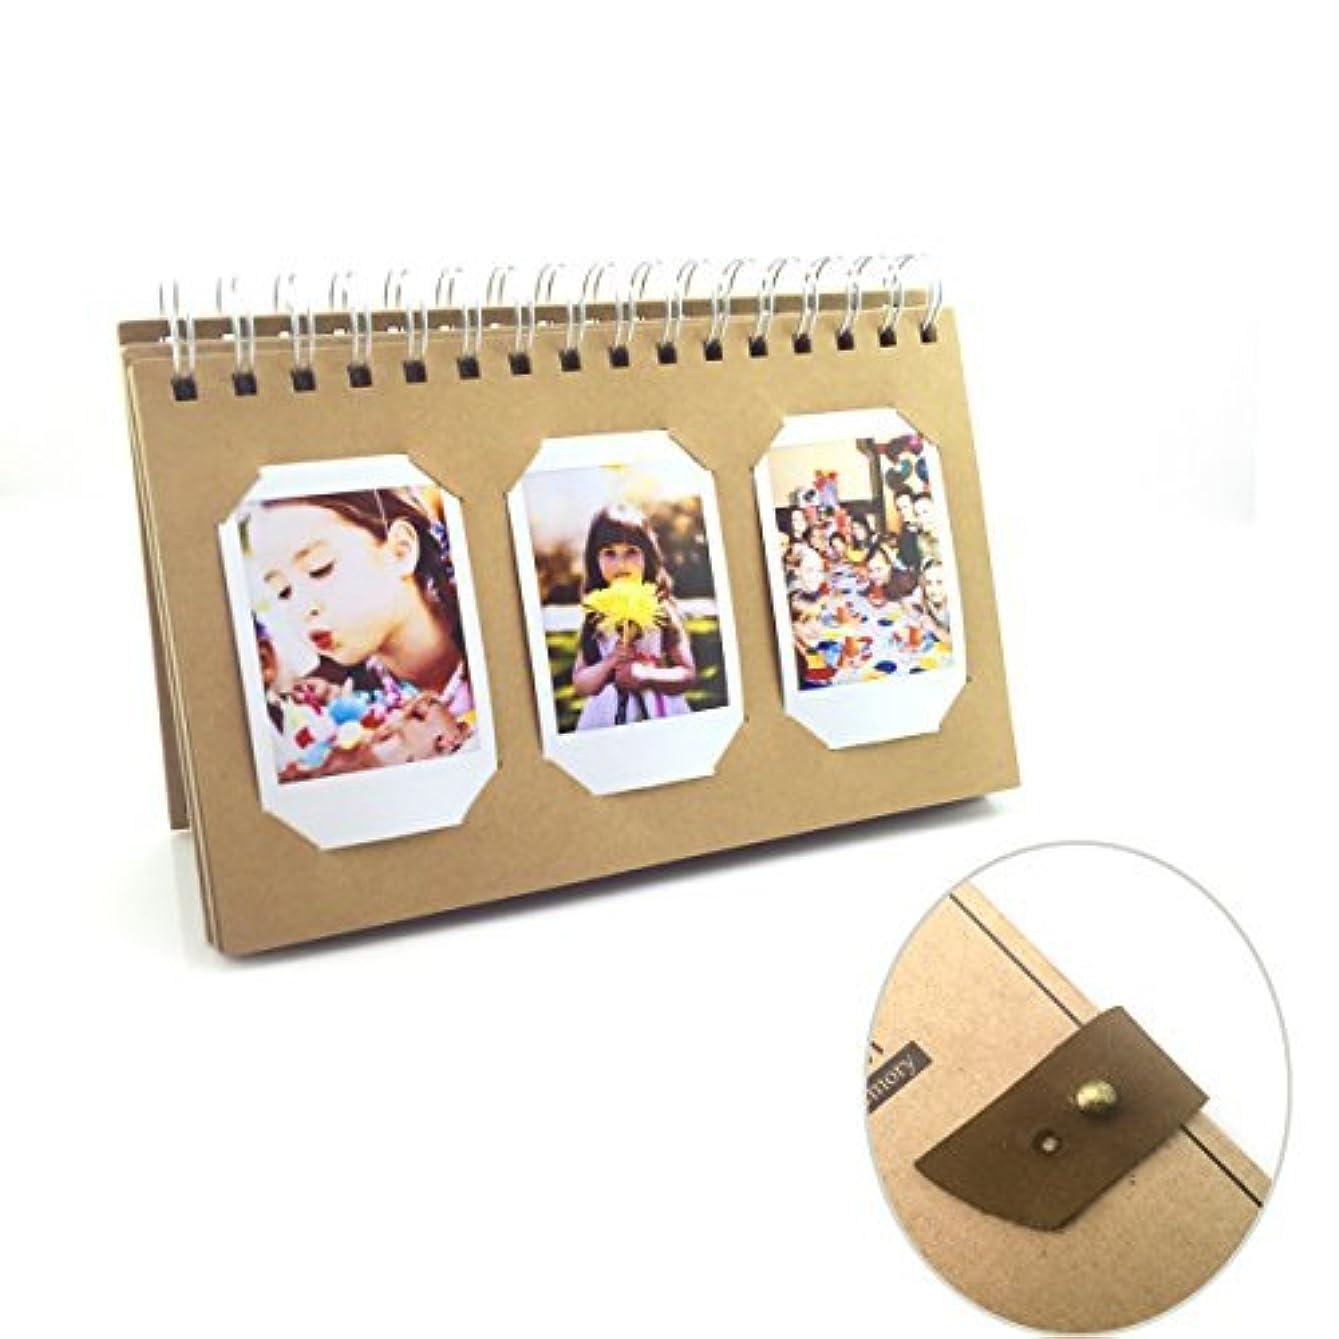 Instax Film Album for Fujifilm InstaxMini 8 9 Mini 90 Mini 70 Mini 7s Mini 25 Mini 50s Instax Mini 90 Neo Classic Instax Mini Hello Kitty Share Sp-1 Instant Cameras, Polaroid Pic-300 Mini Film -Floral zyvknl496300